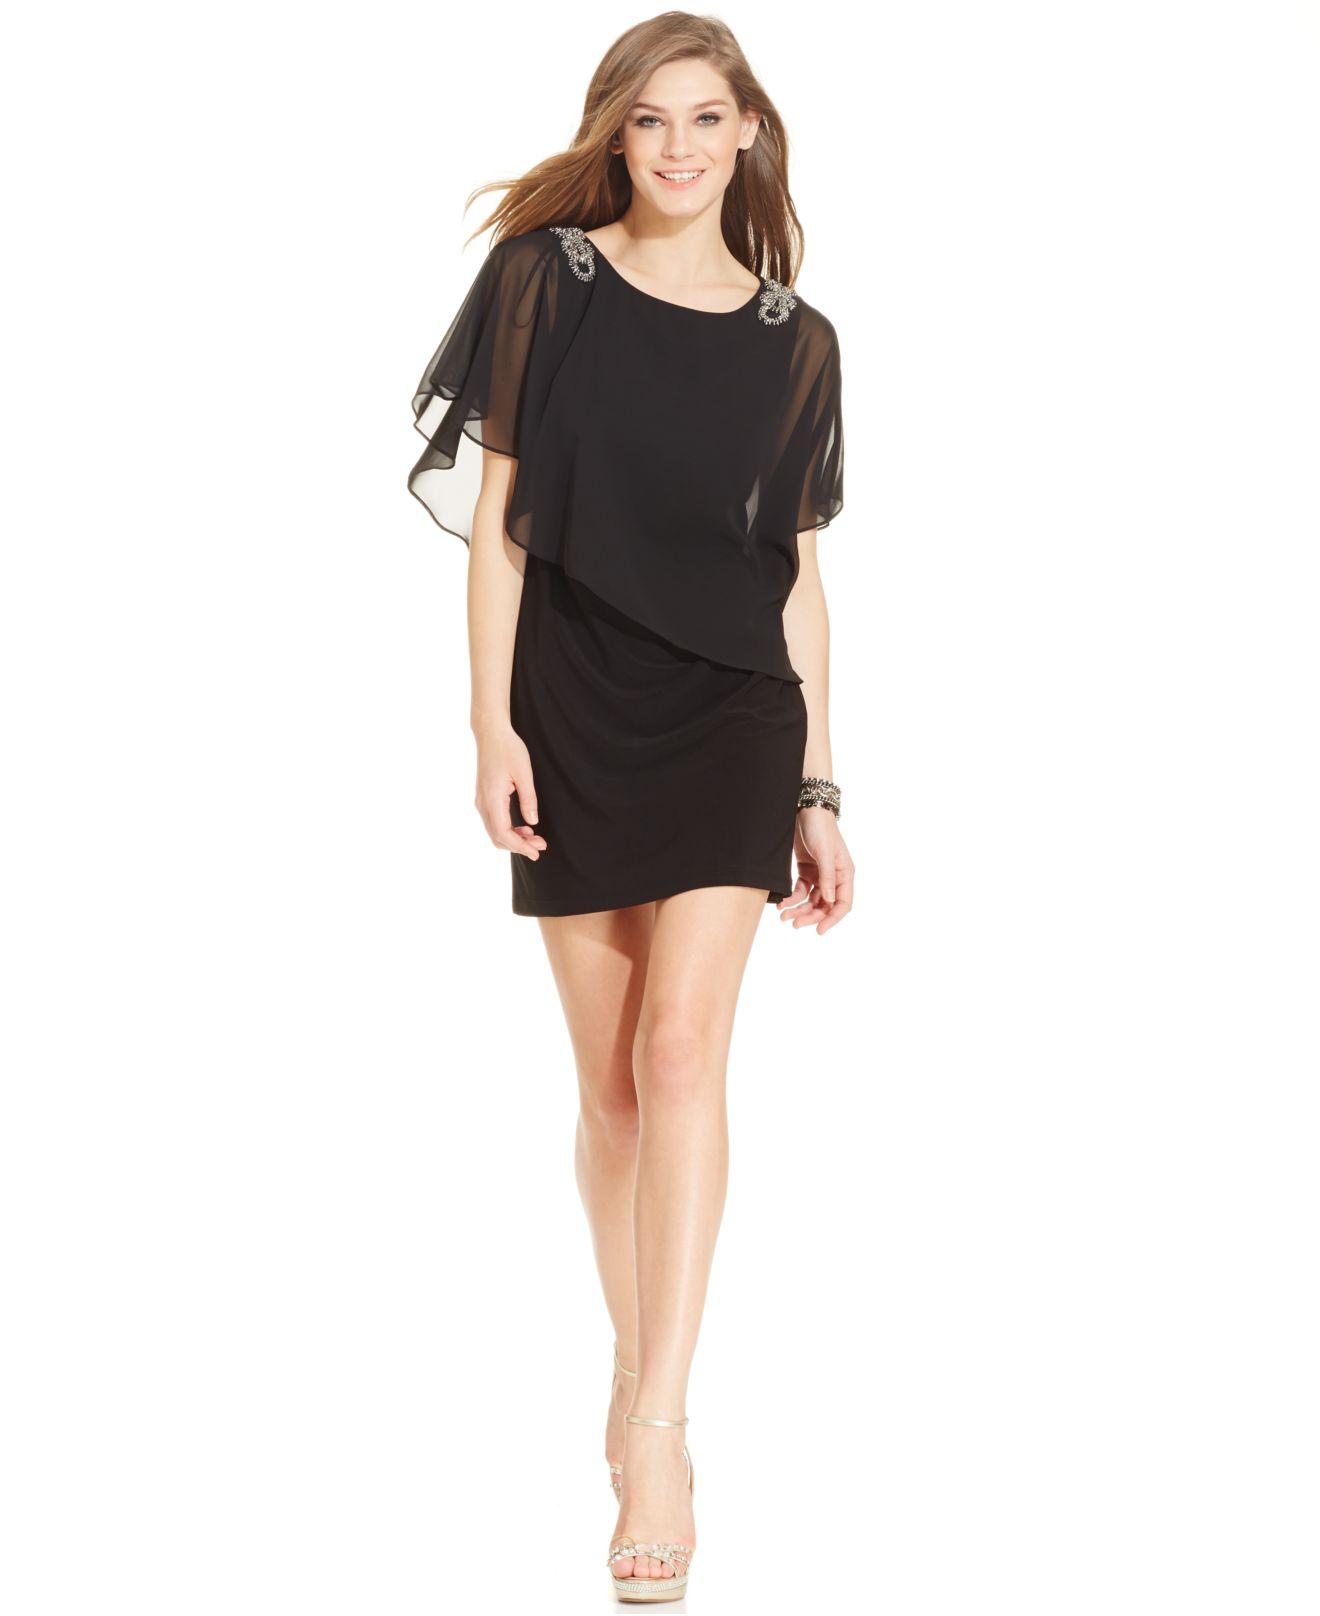 Xscape Petite Embellished Chiffon Capelet Dress in Black   Lyst